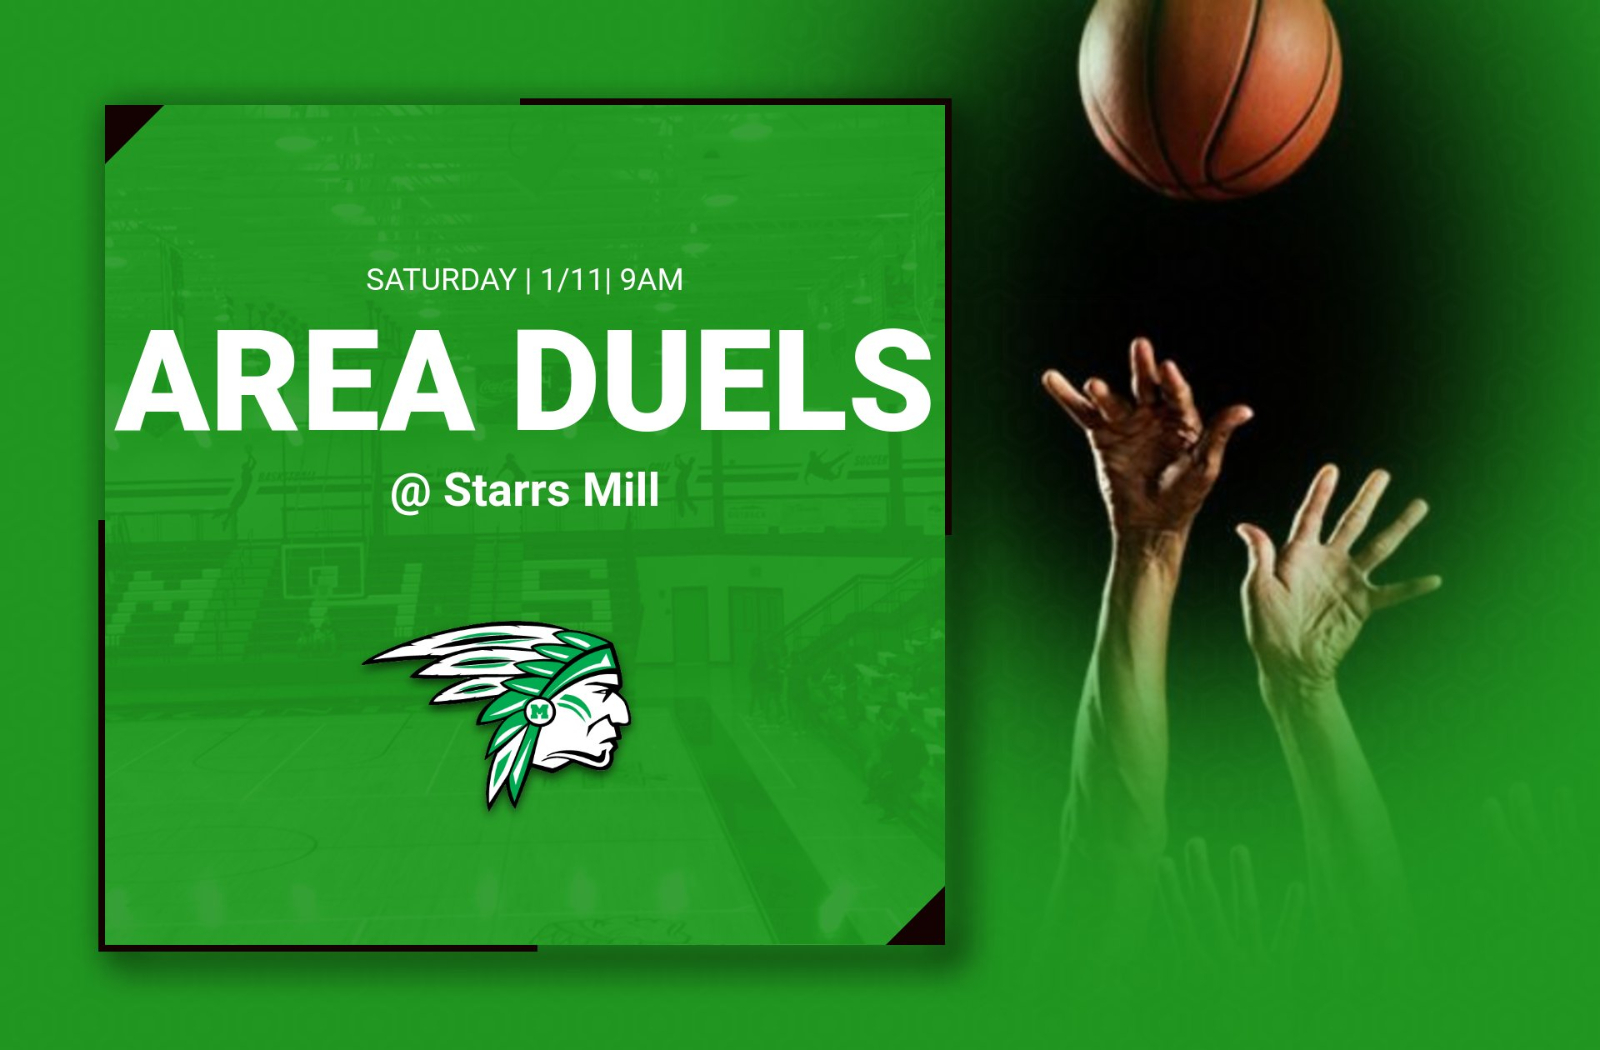 Wrestling Area Duels Saturday 1/11 @ Starrs Mill